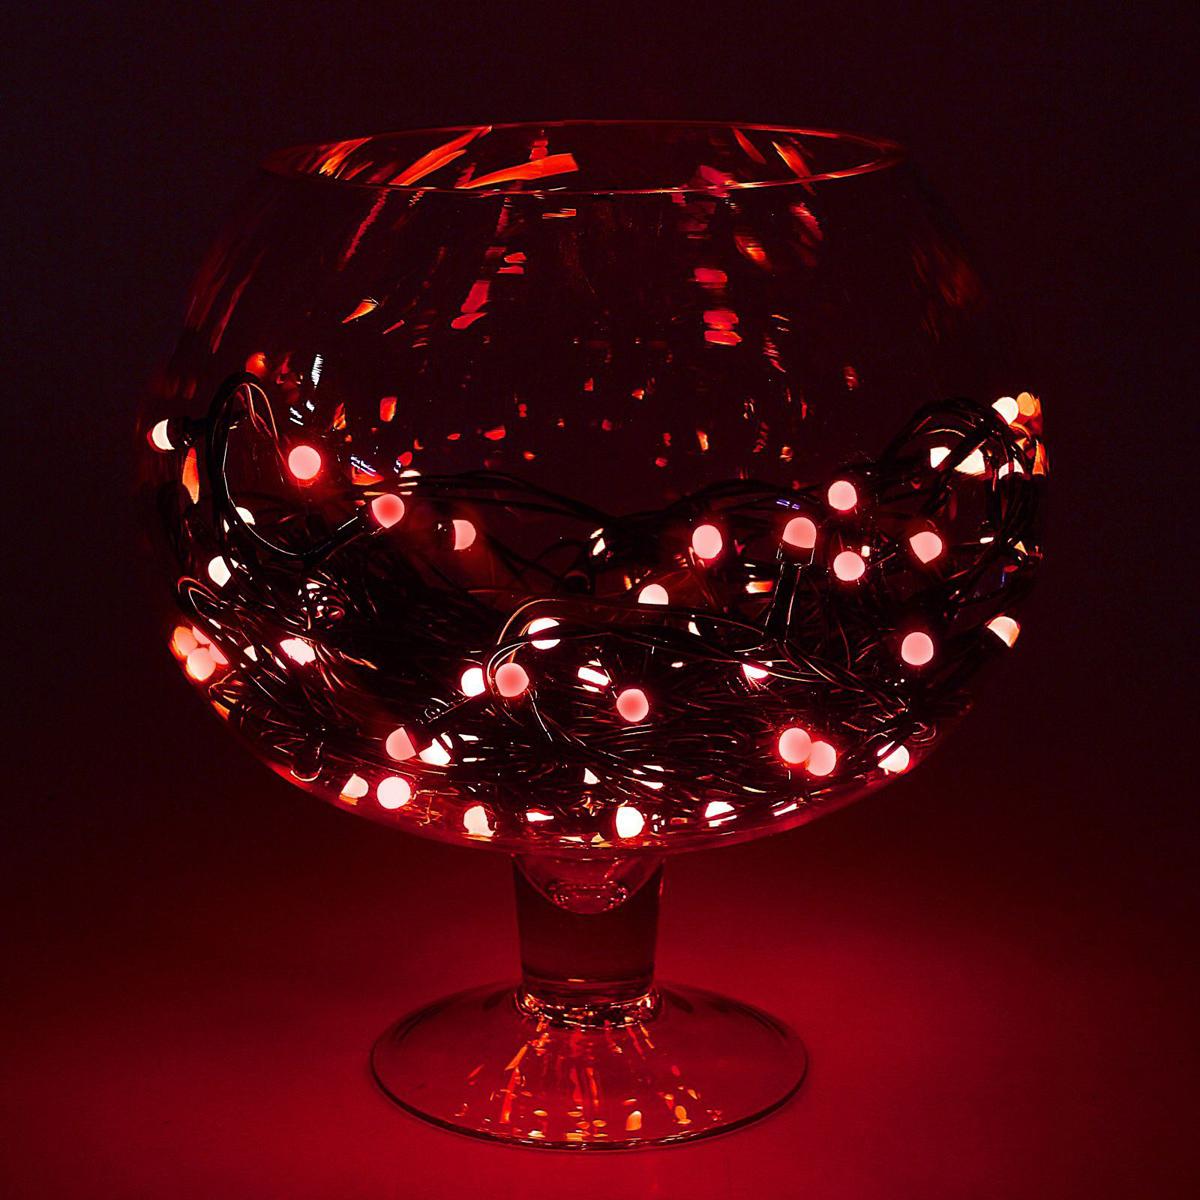 Гирлянда Luazon Метраж, длина 20 м, LED 200 ламп, 220V, цвет: красный гирлянда luazon метраж цветы 5m led 20 220v 185506